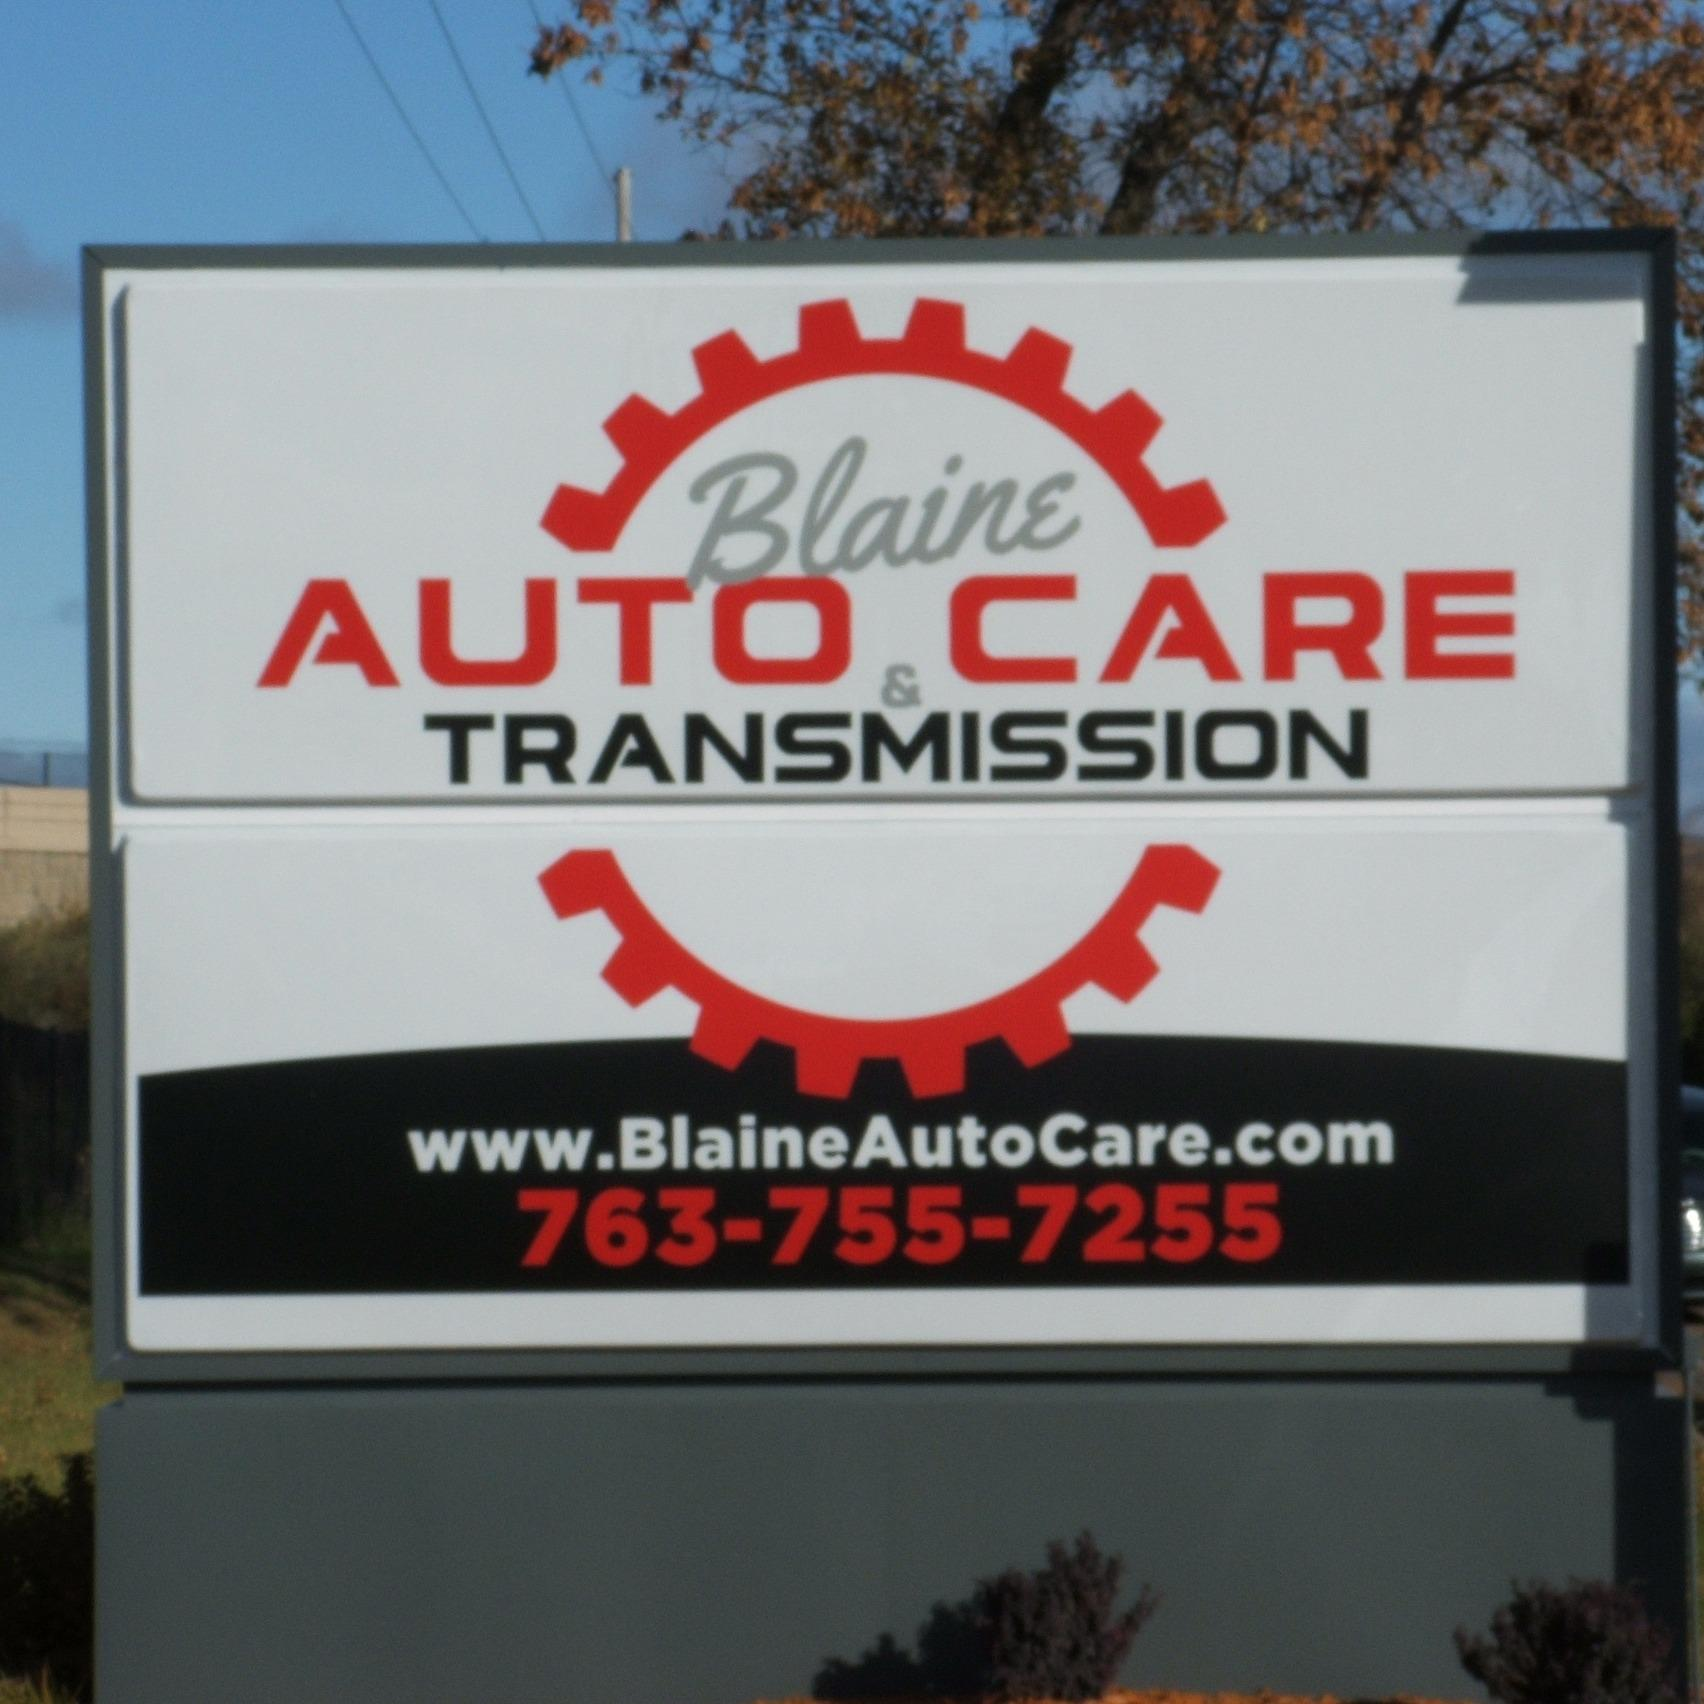 Blaine Auto Care & Transmission